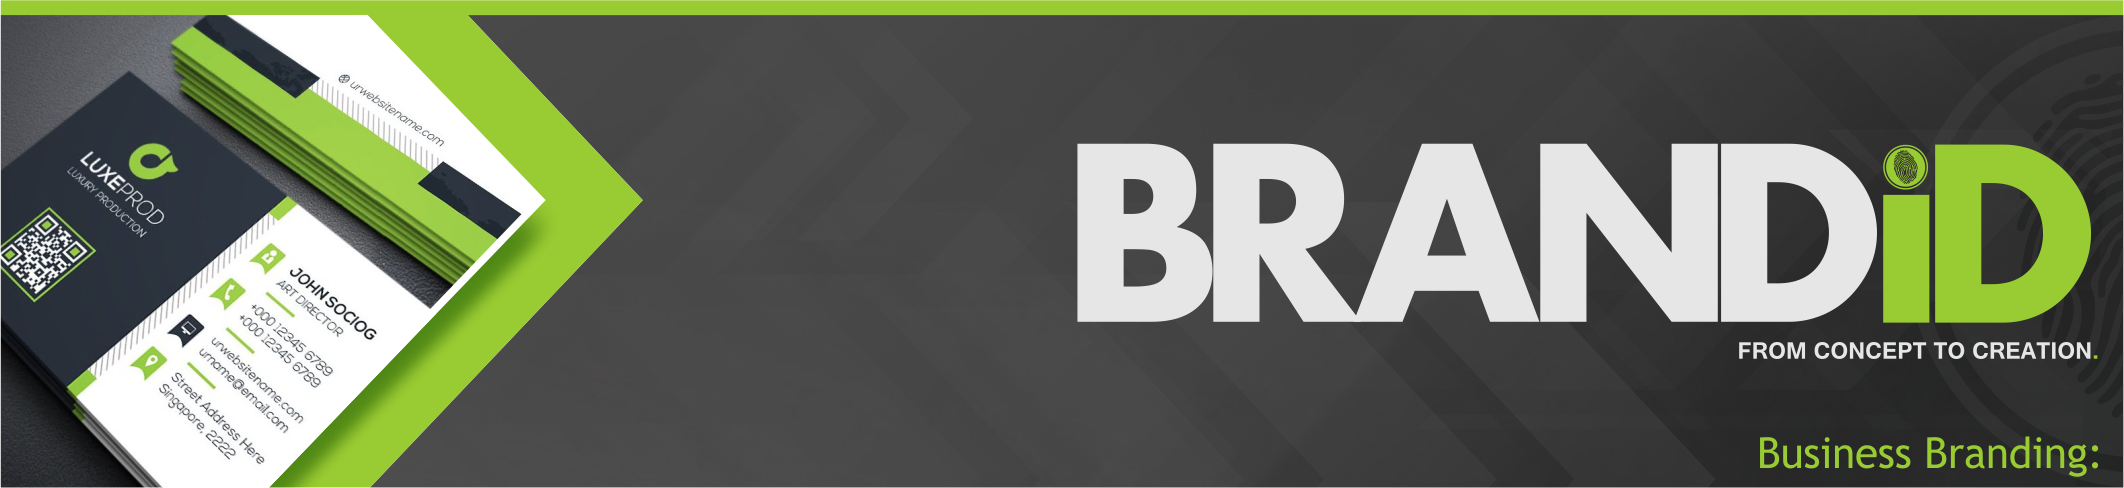 Business Branding 1.2